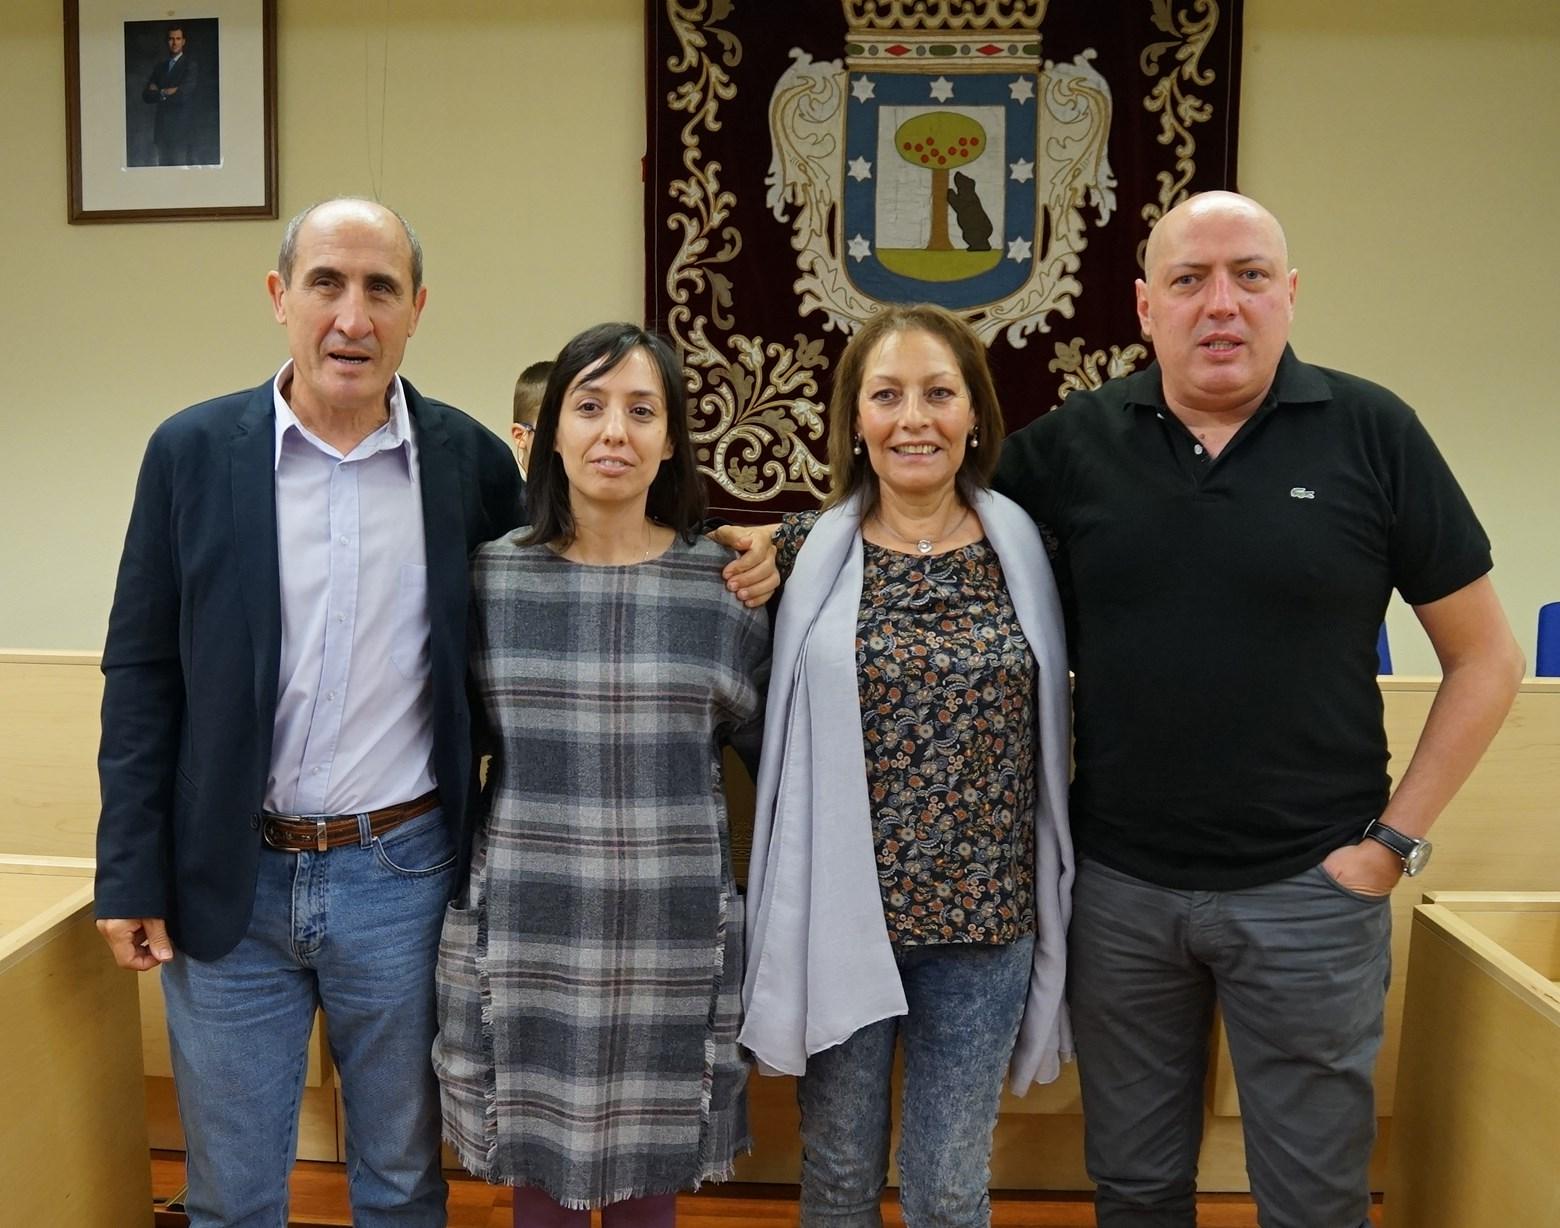 GRUPO MUNICIPAL SOCIALISTA DE BARAJAS